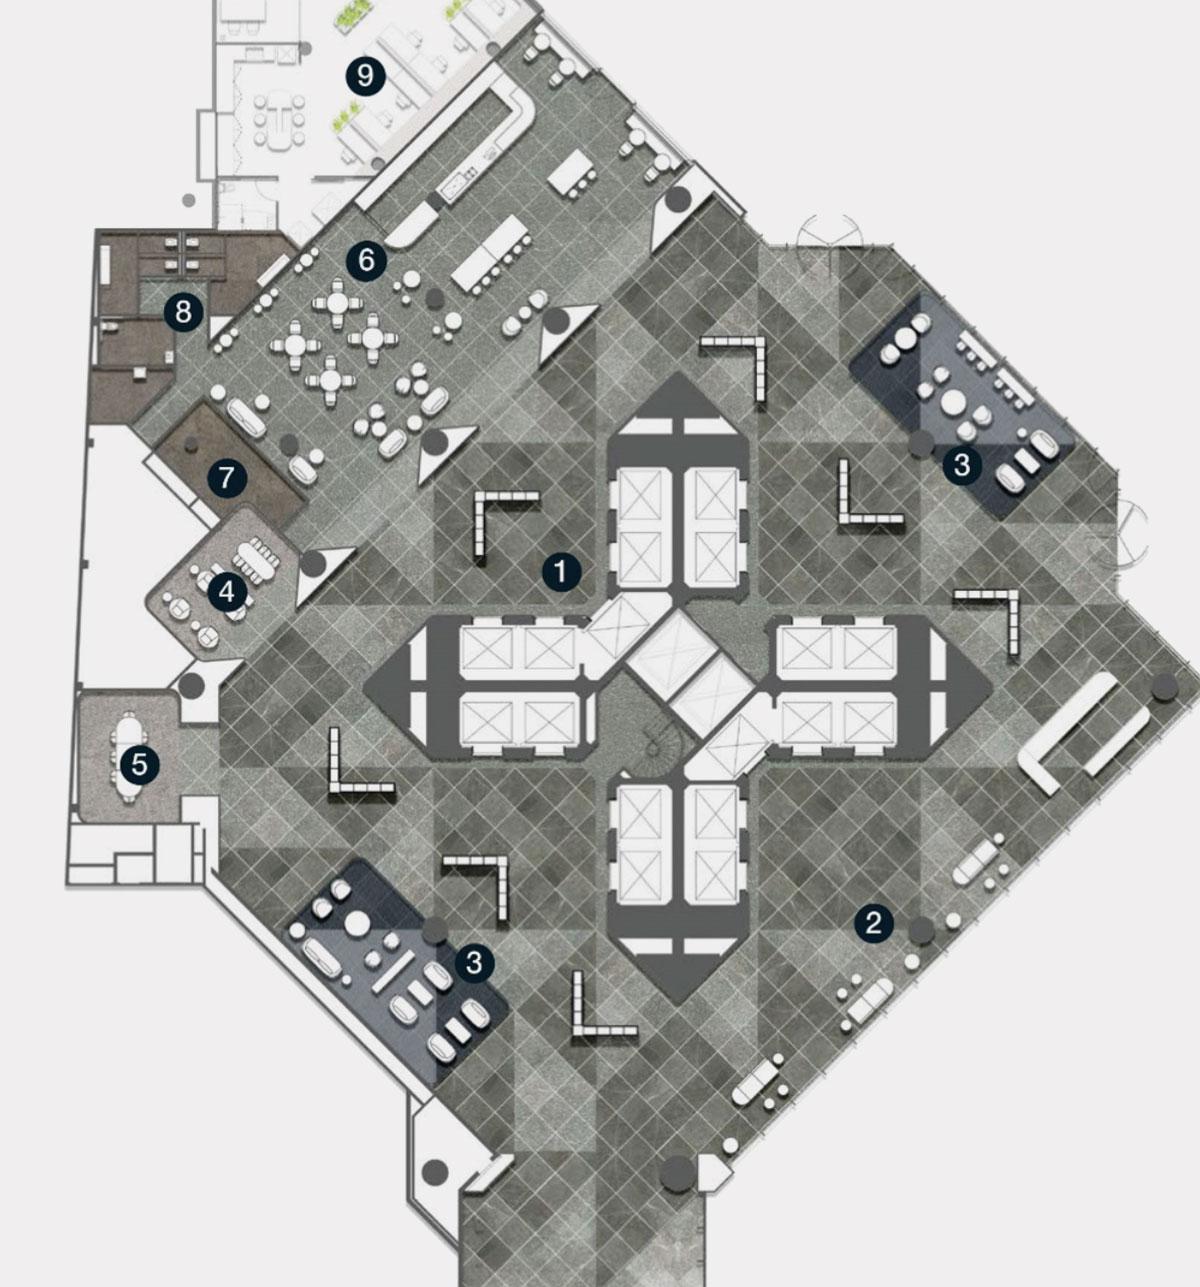 The building's geometric floorplate